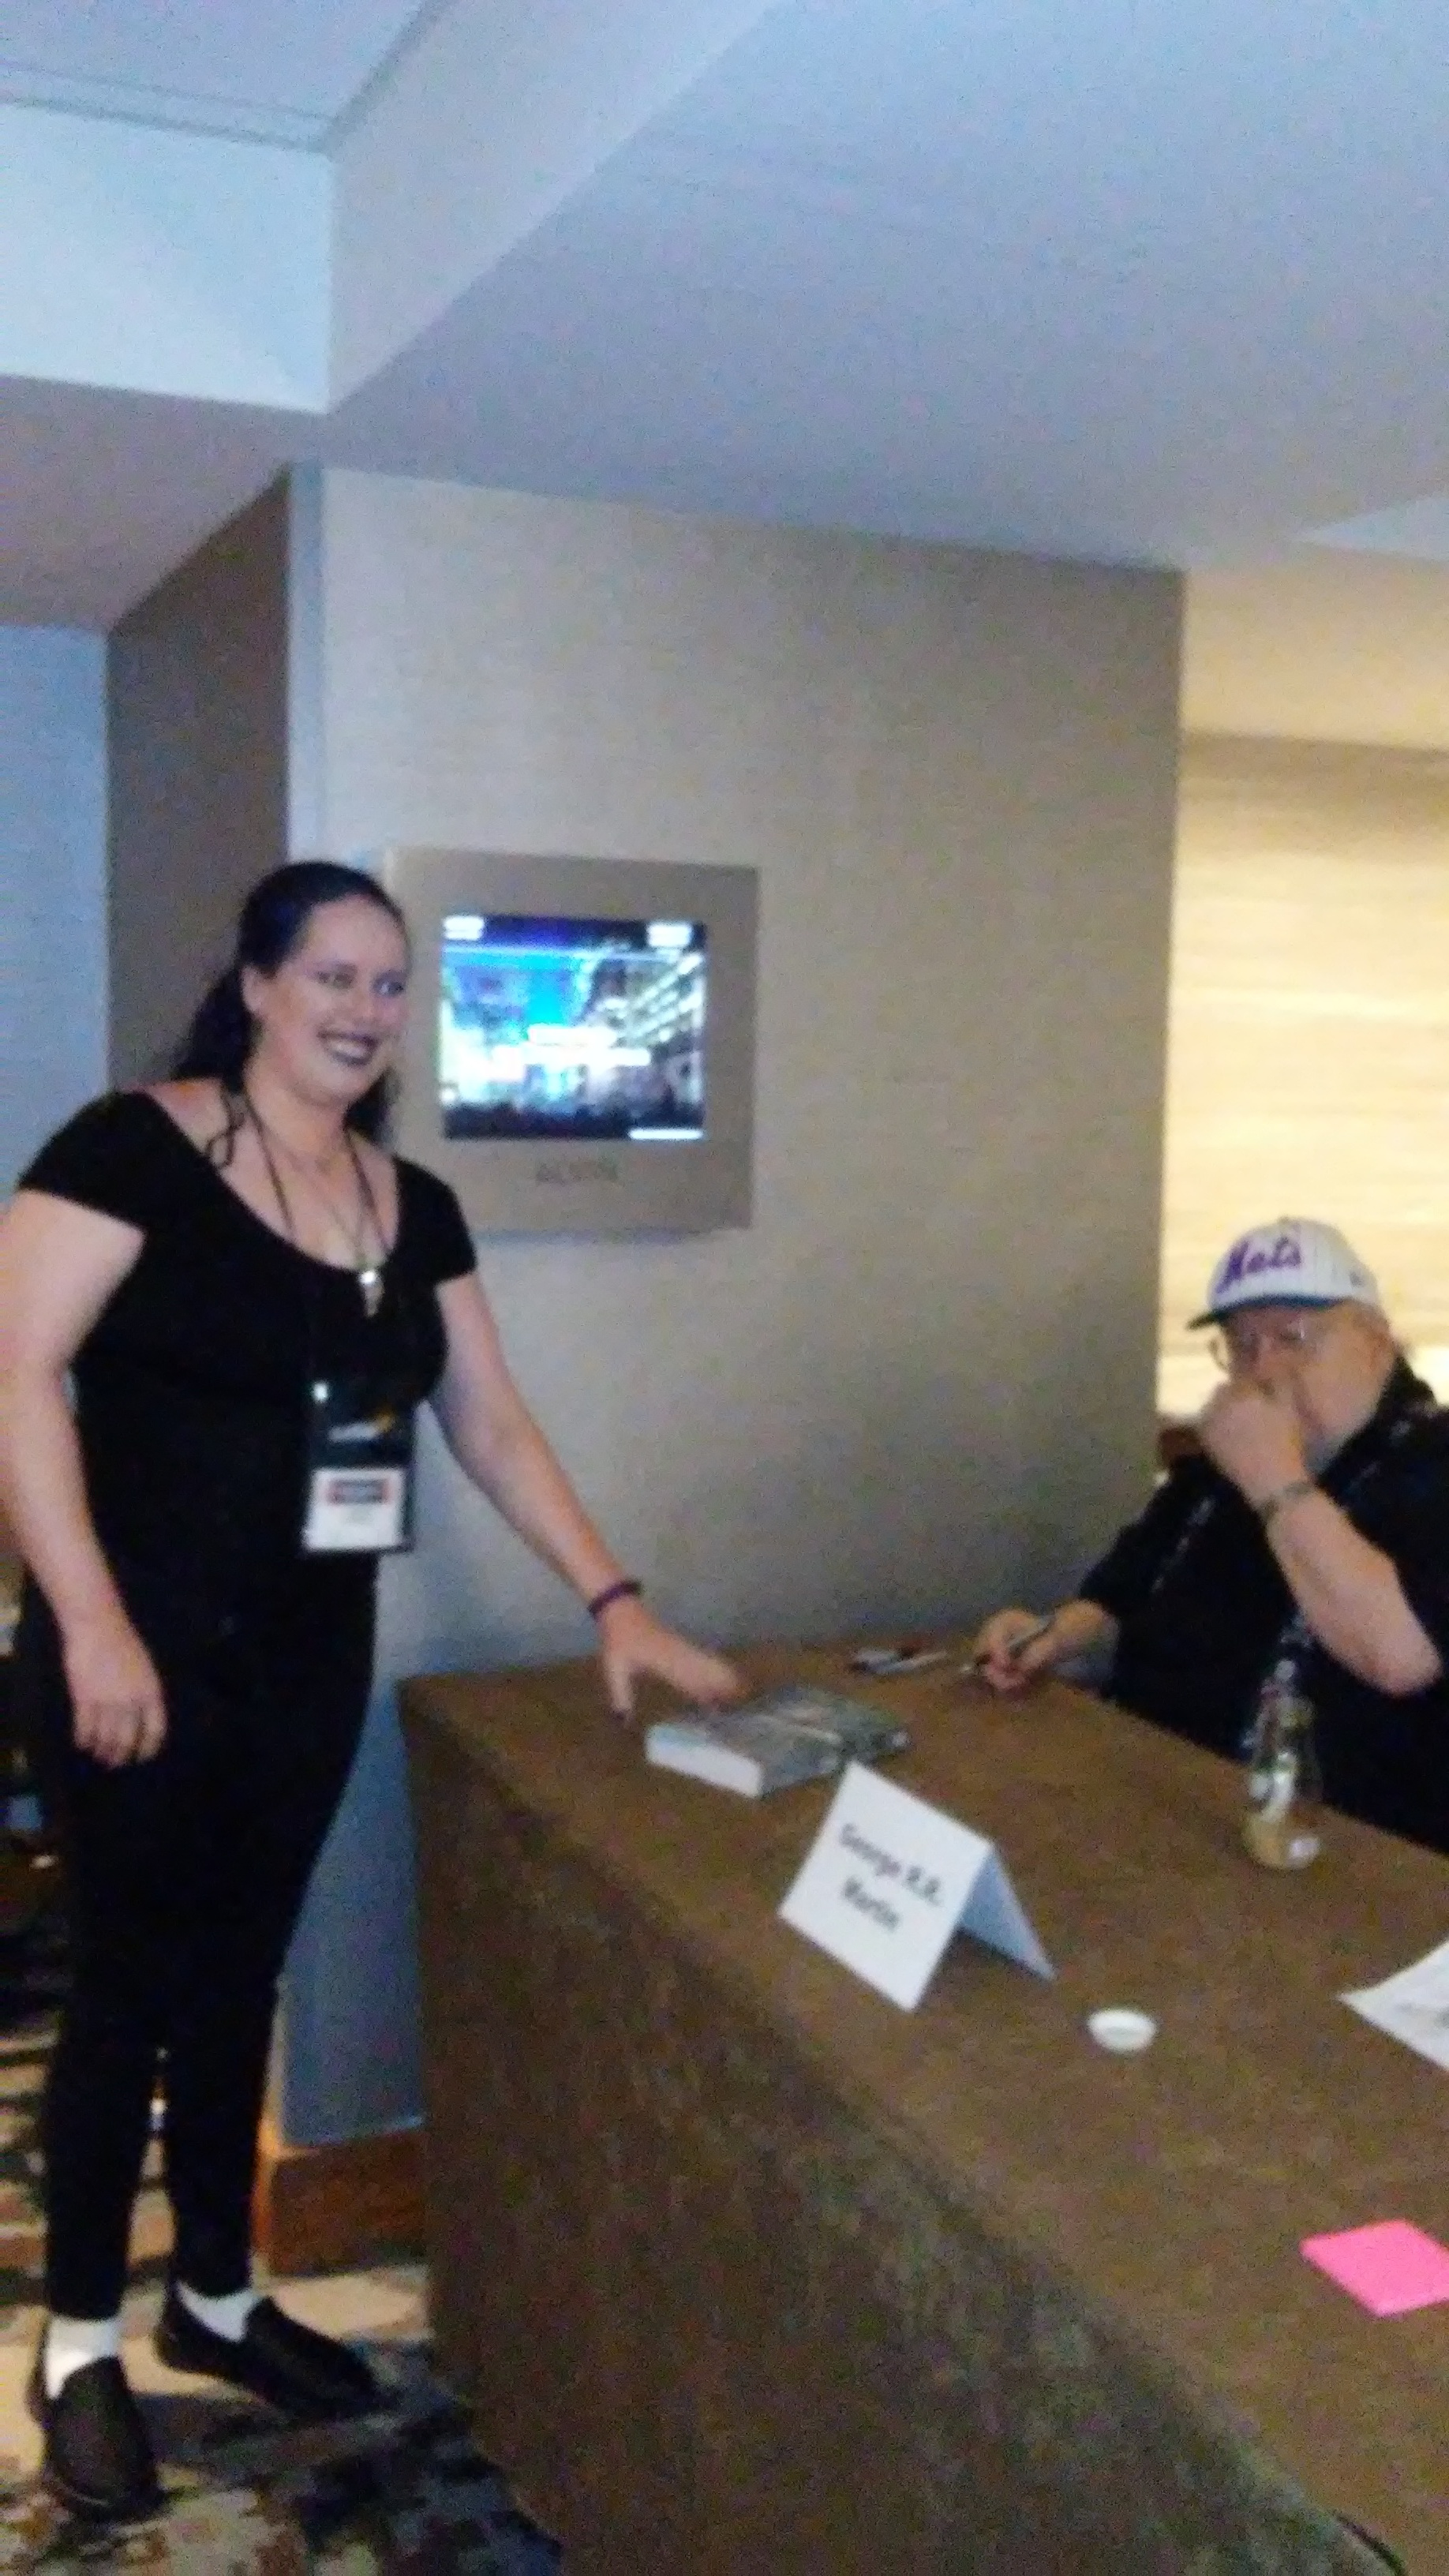 Blurry proof that I met George RR Martin!